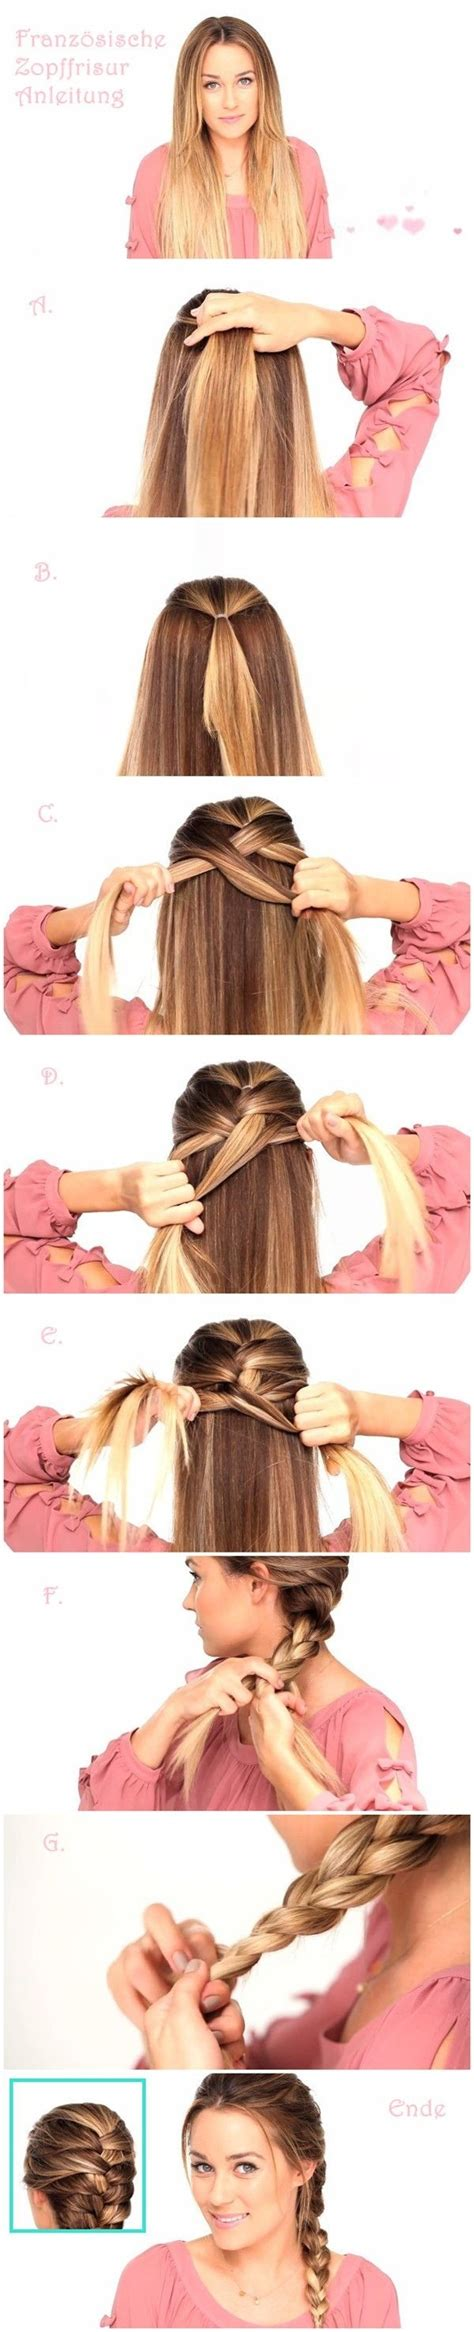 10 french braids hairstyles tutorials everyday hair styles popular